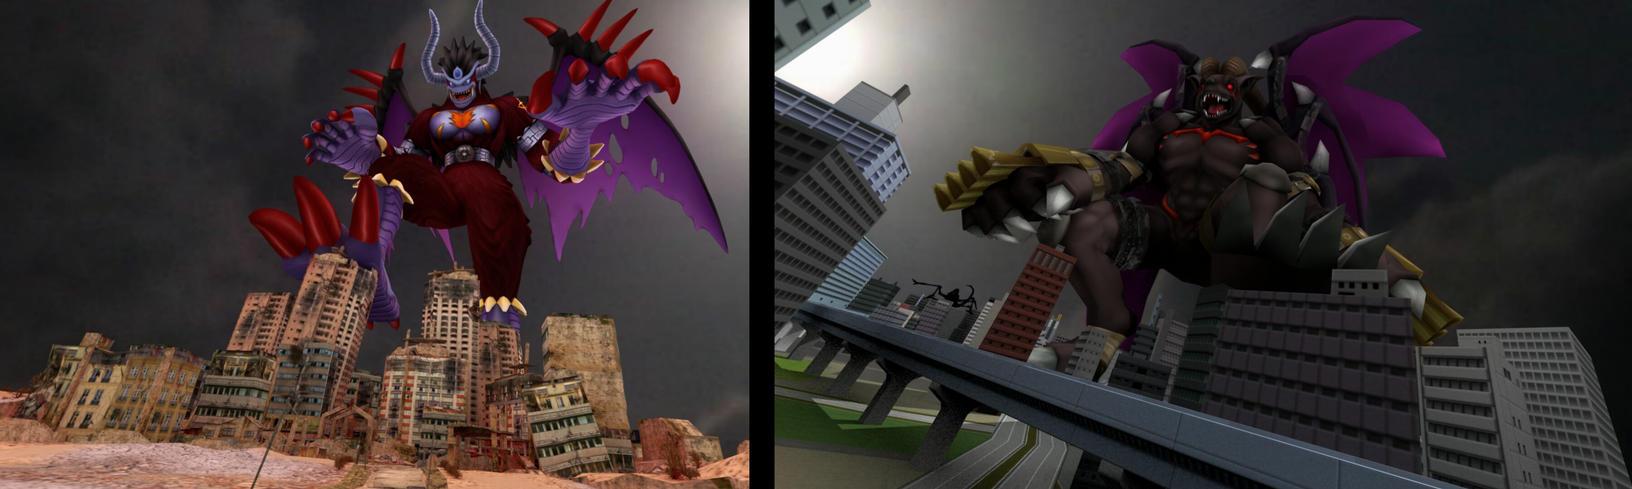 Digimon Pack 23 for XNAlara by RPGxplay